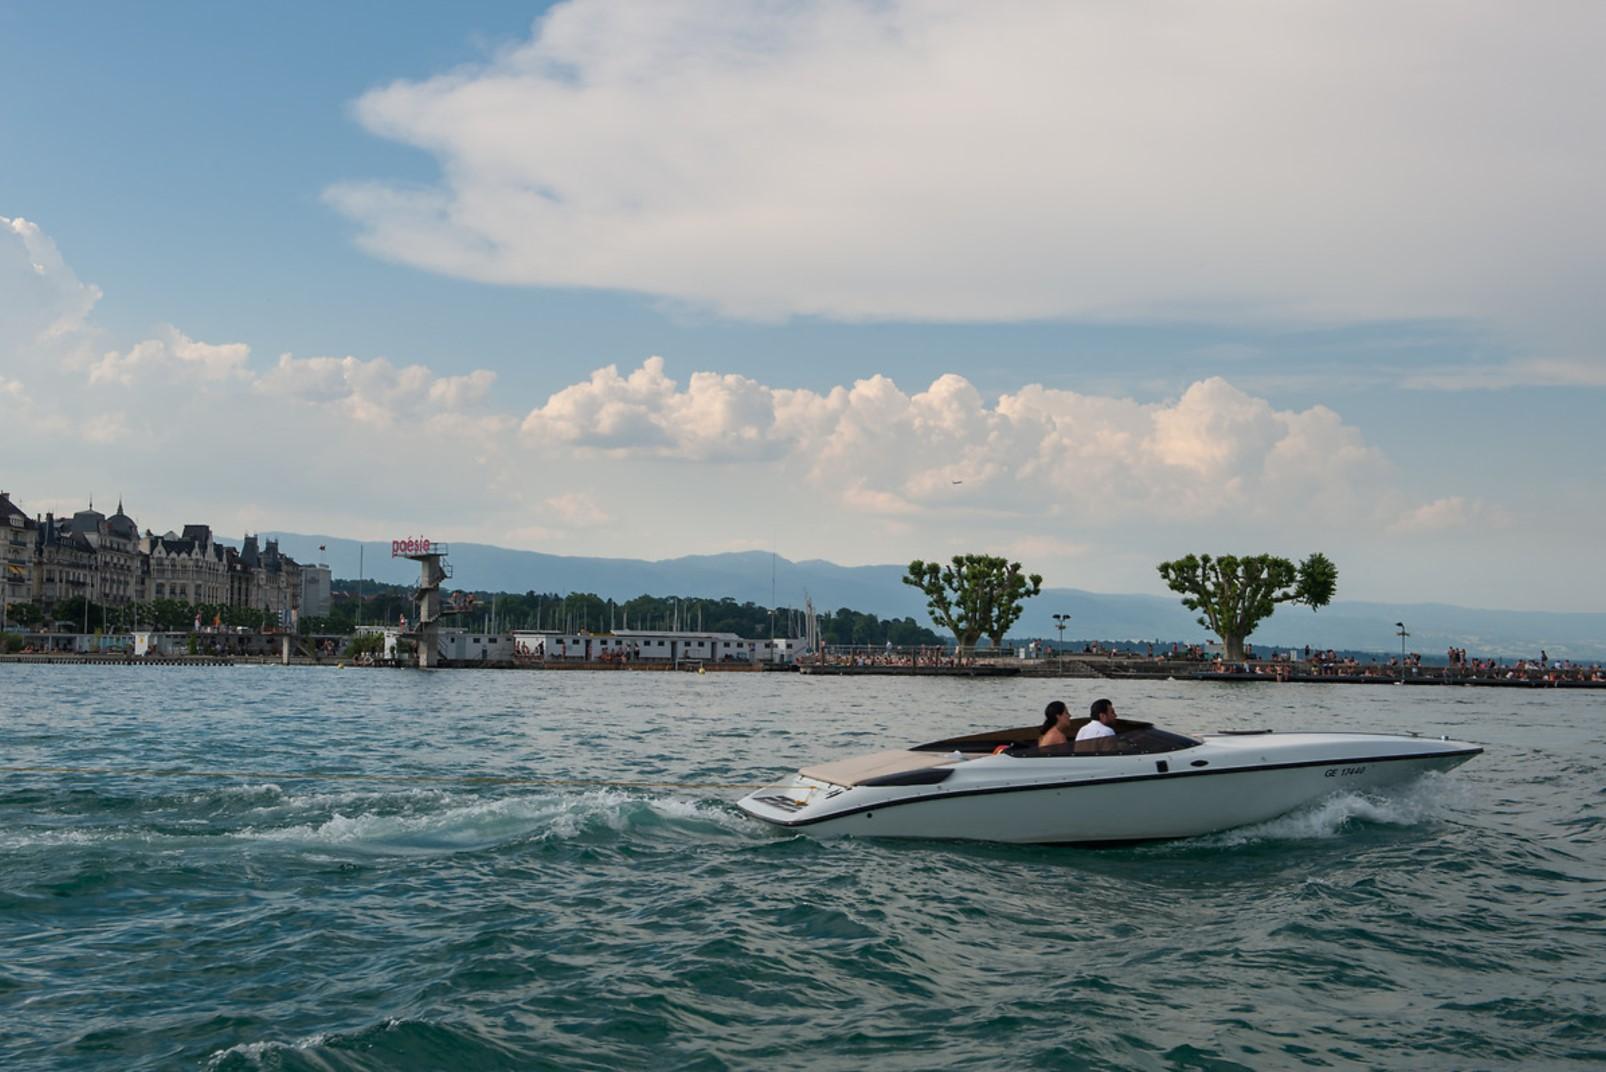 Bains des Paquis - Geneva